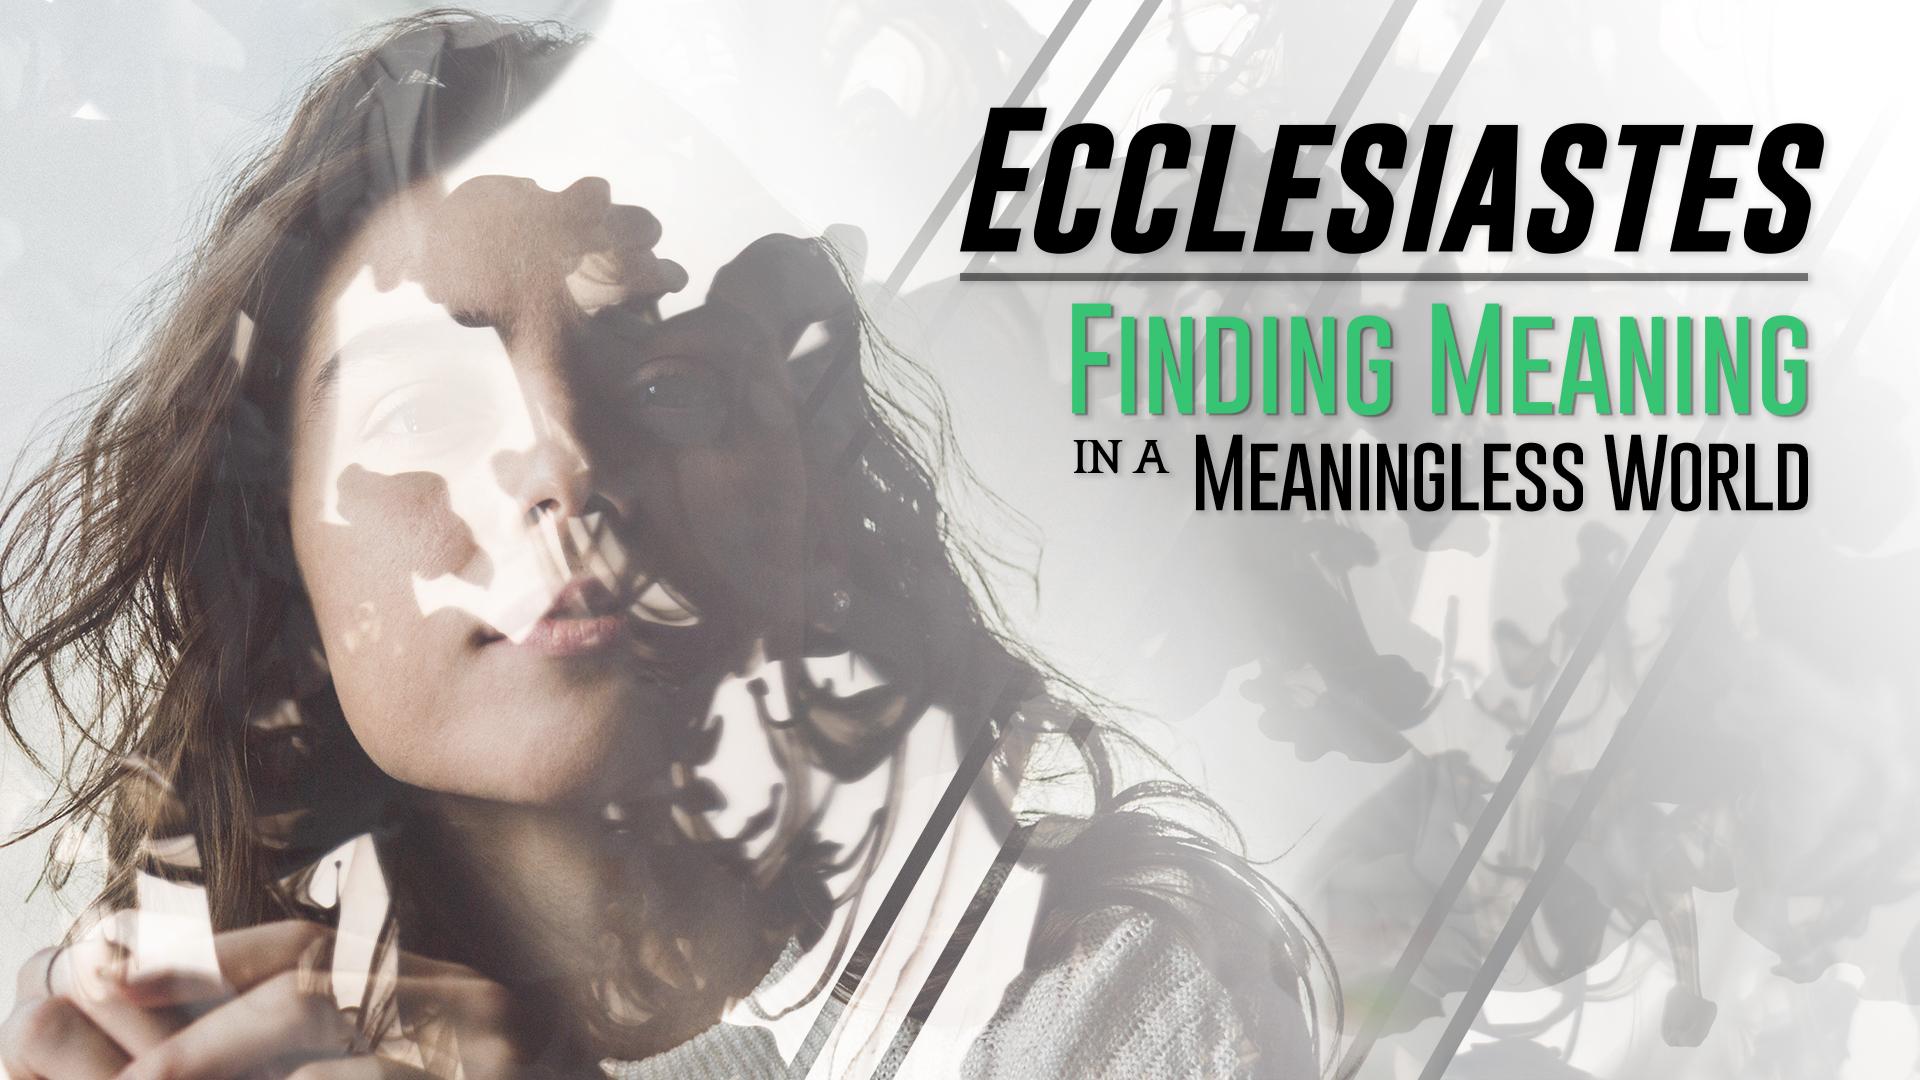 Ecclesiastes slide.jpg